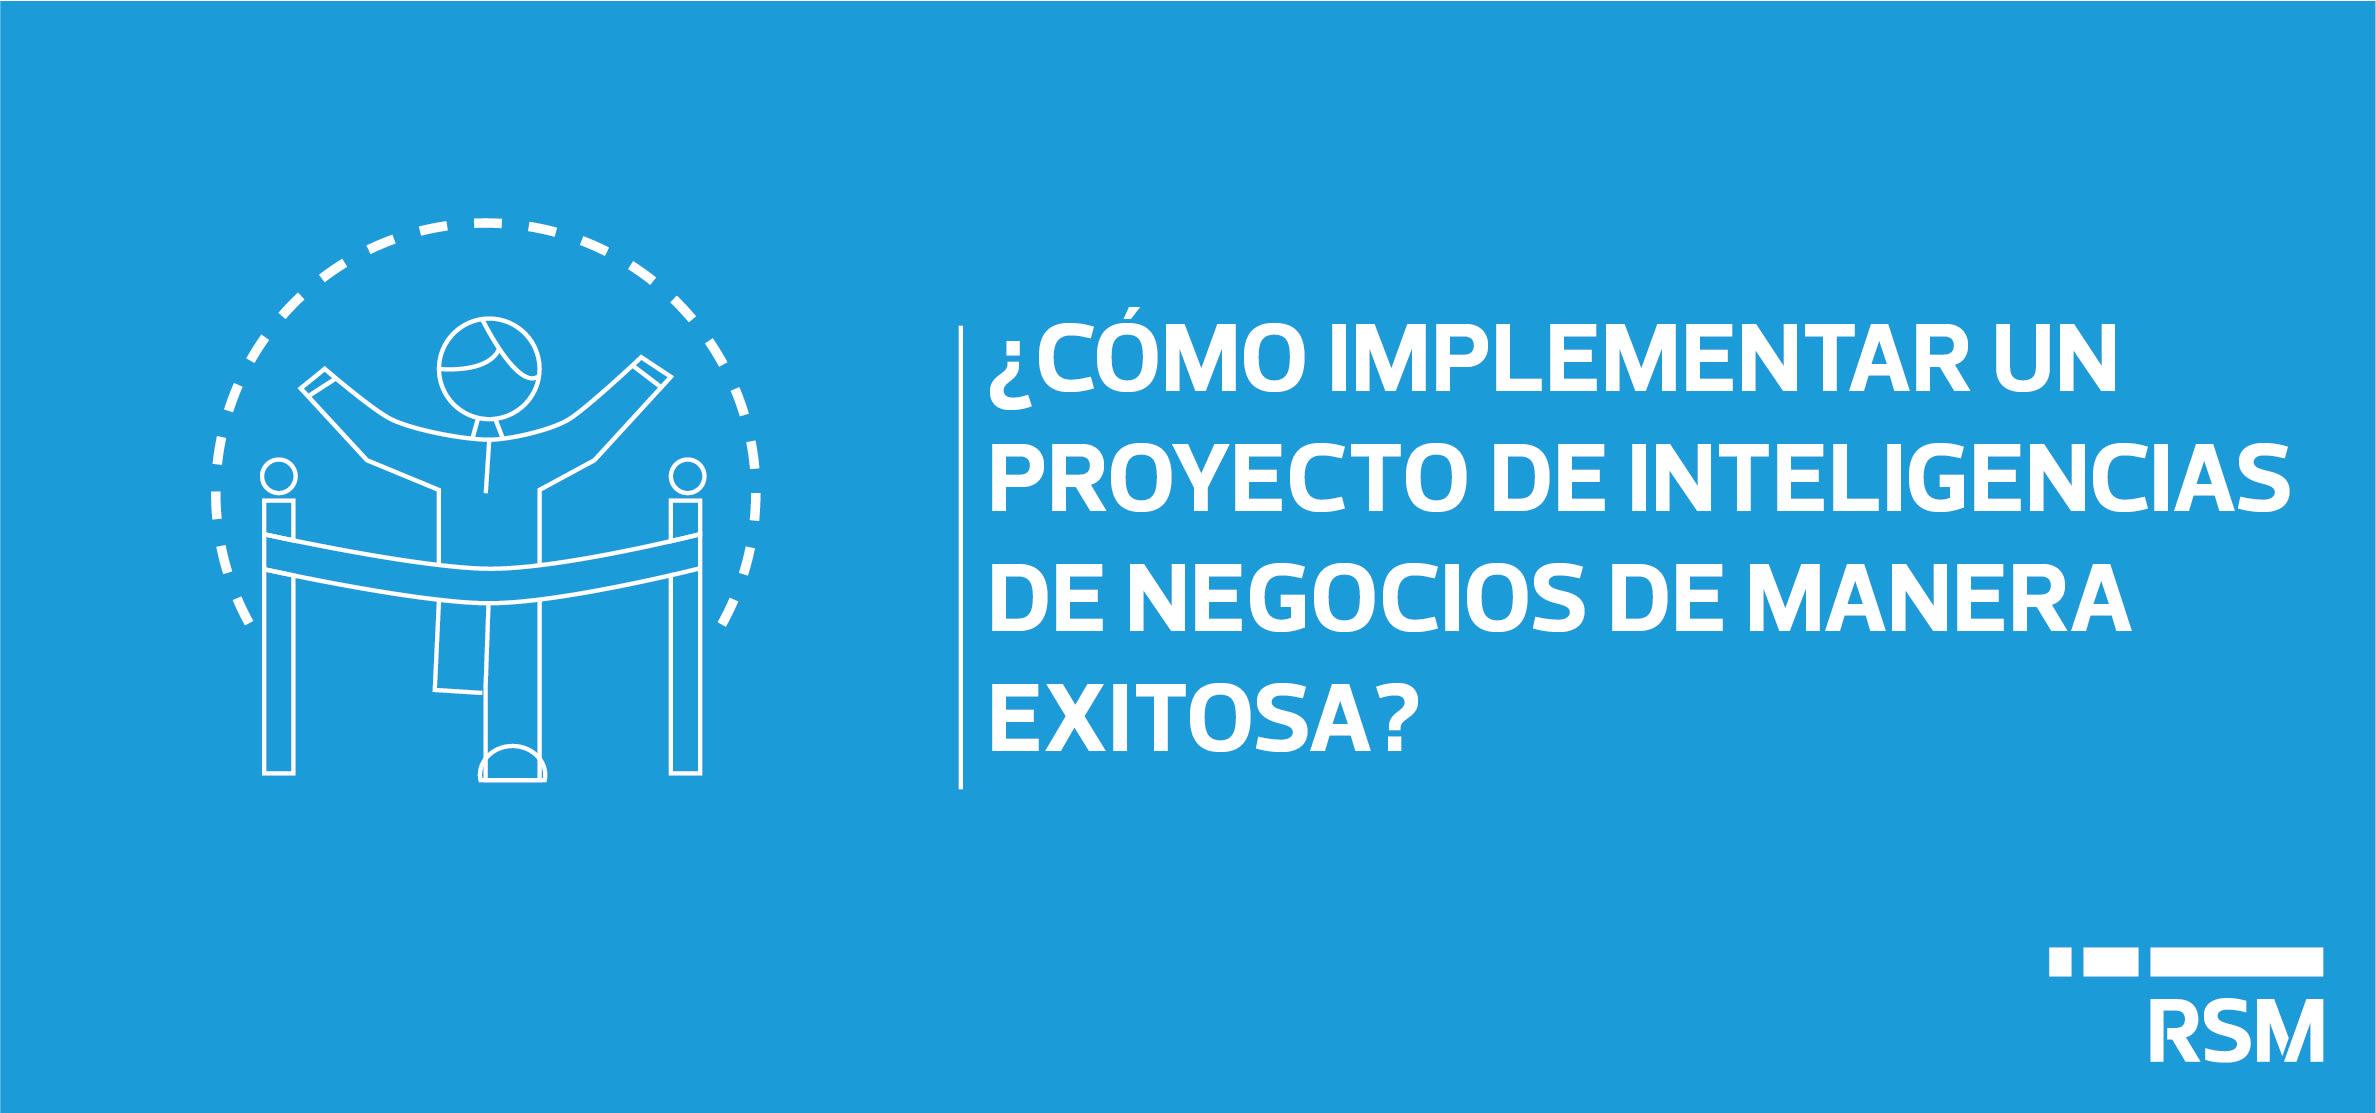 public://media/Lineas_negocio/consultoria/Insights/IMG/miniaturas_pagina_web_blogs-12.jpg